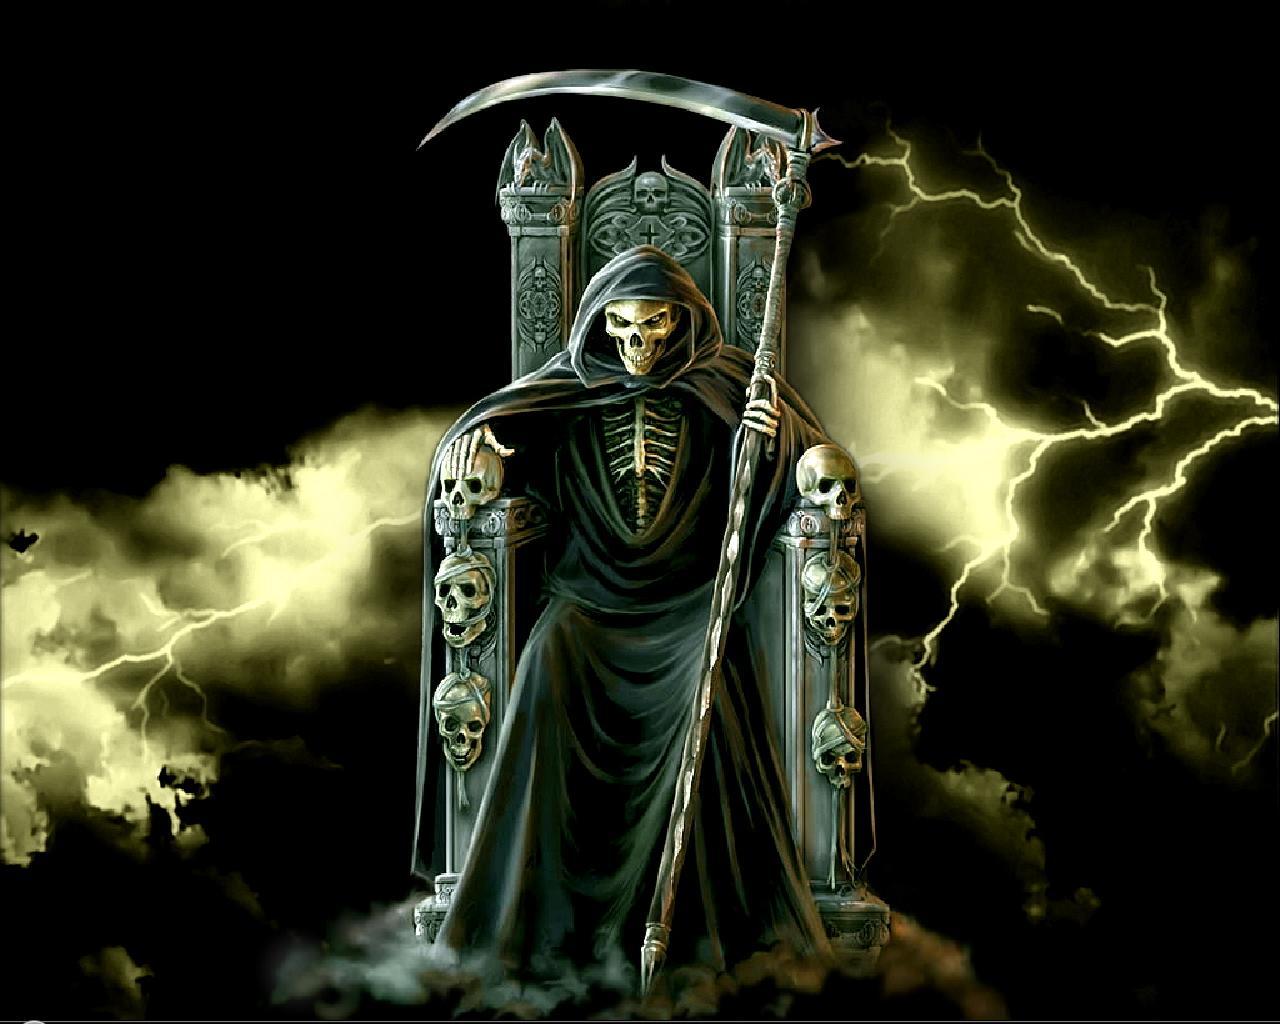 the grim reaper 2011